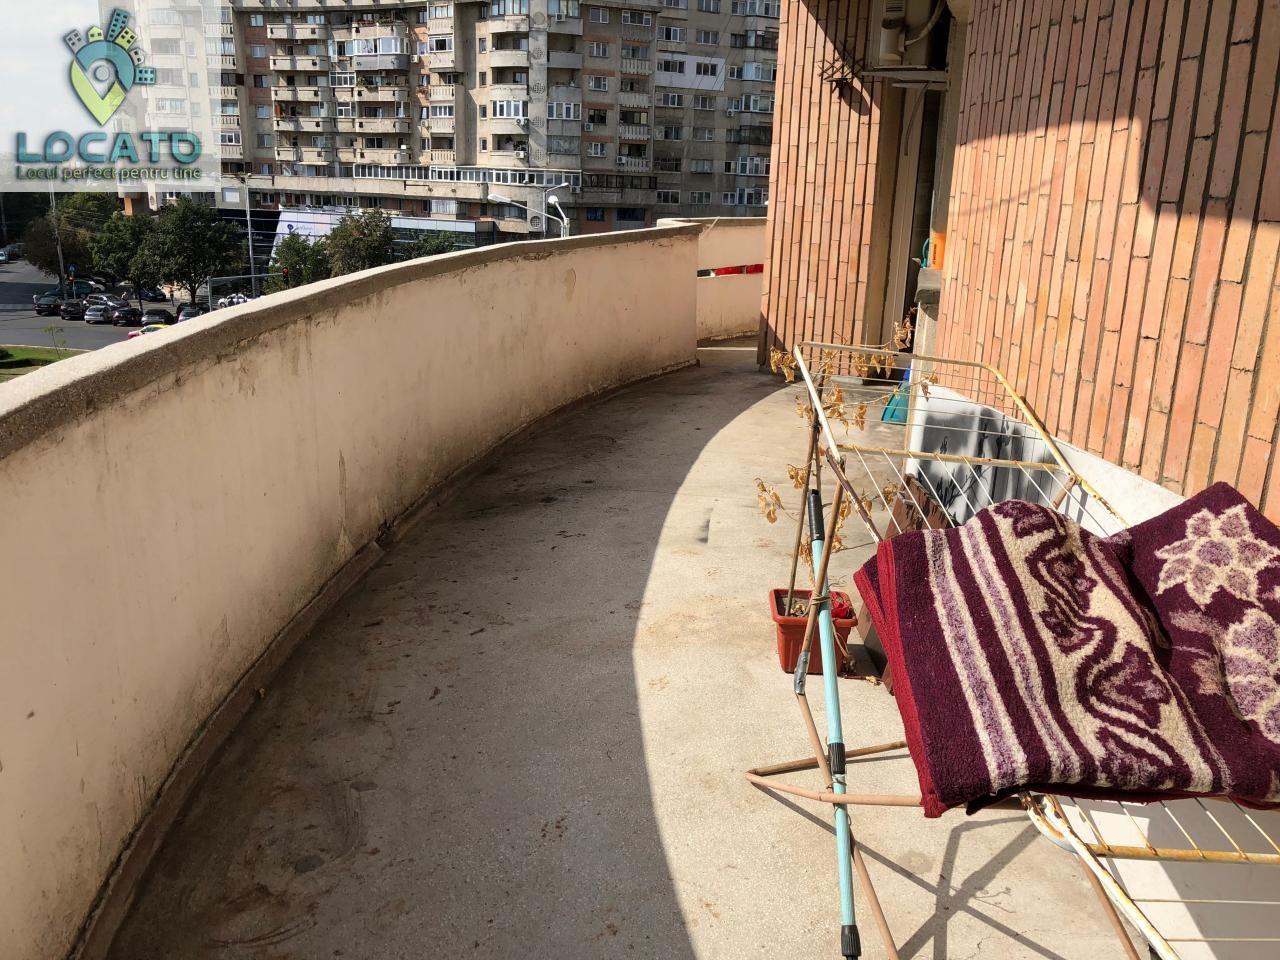 Apartament de vanzare, Ploiesti, Prahova, P-ta Mihai Viteazu - Foto 9